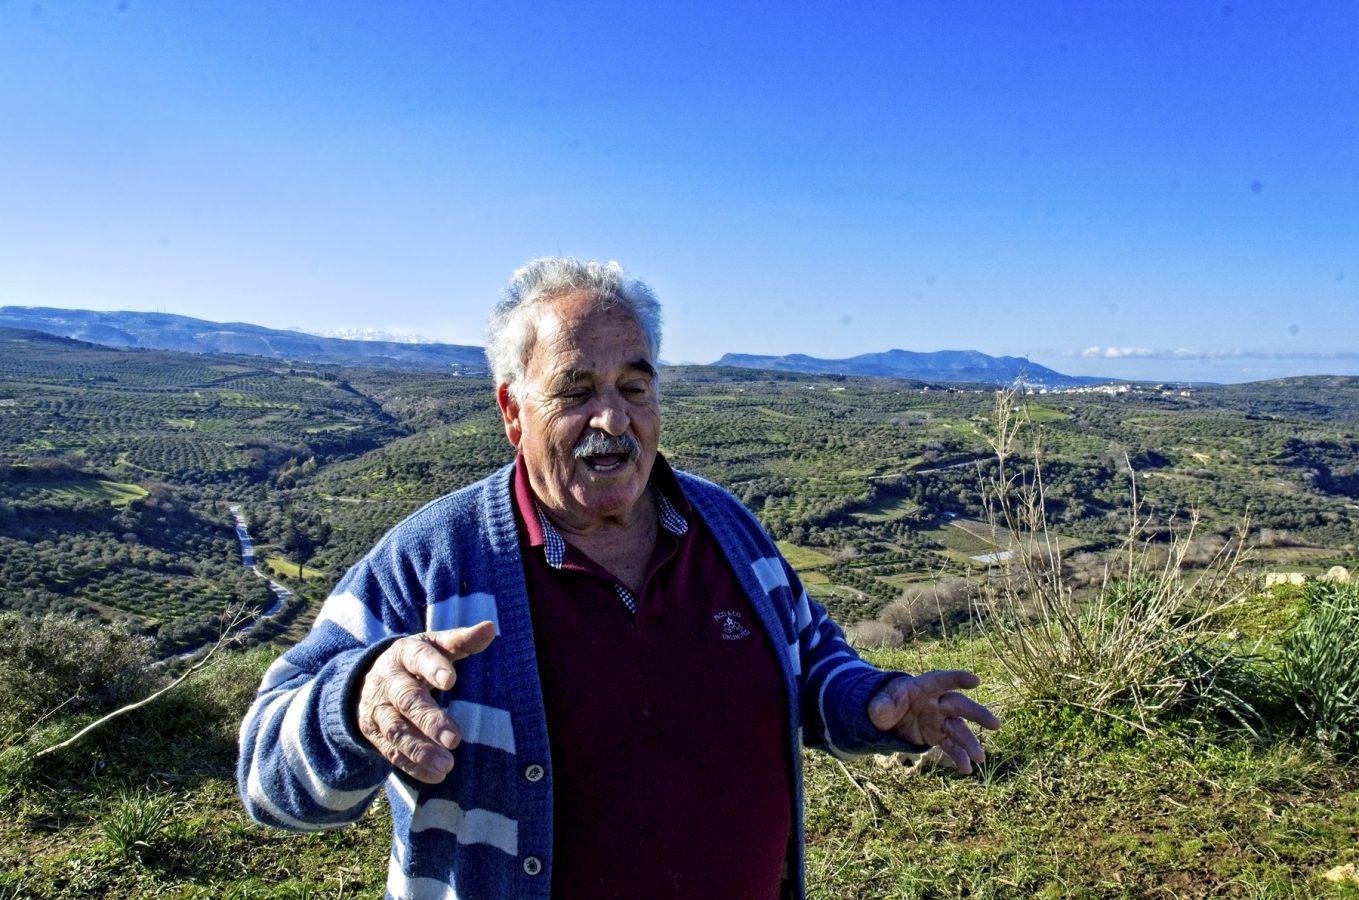 Markos Ladomenos